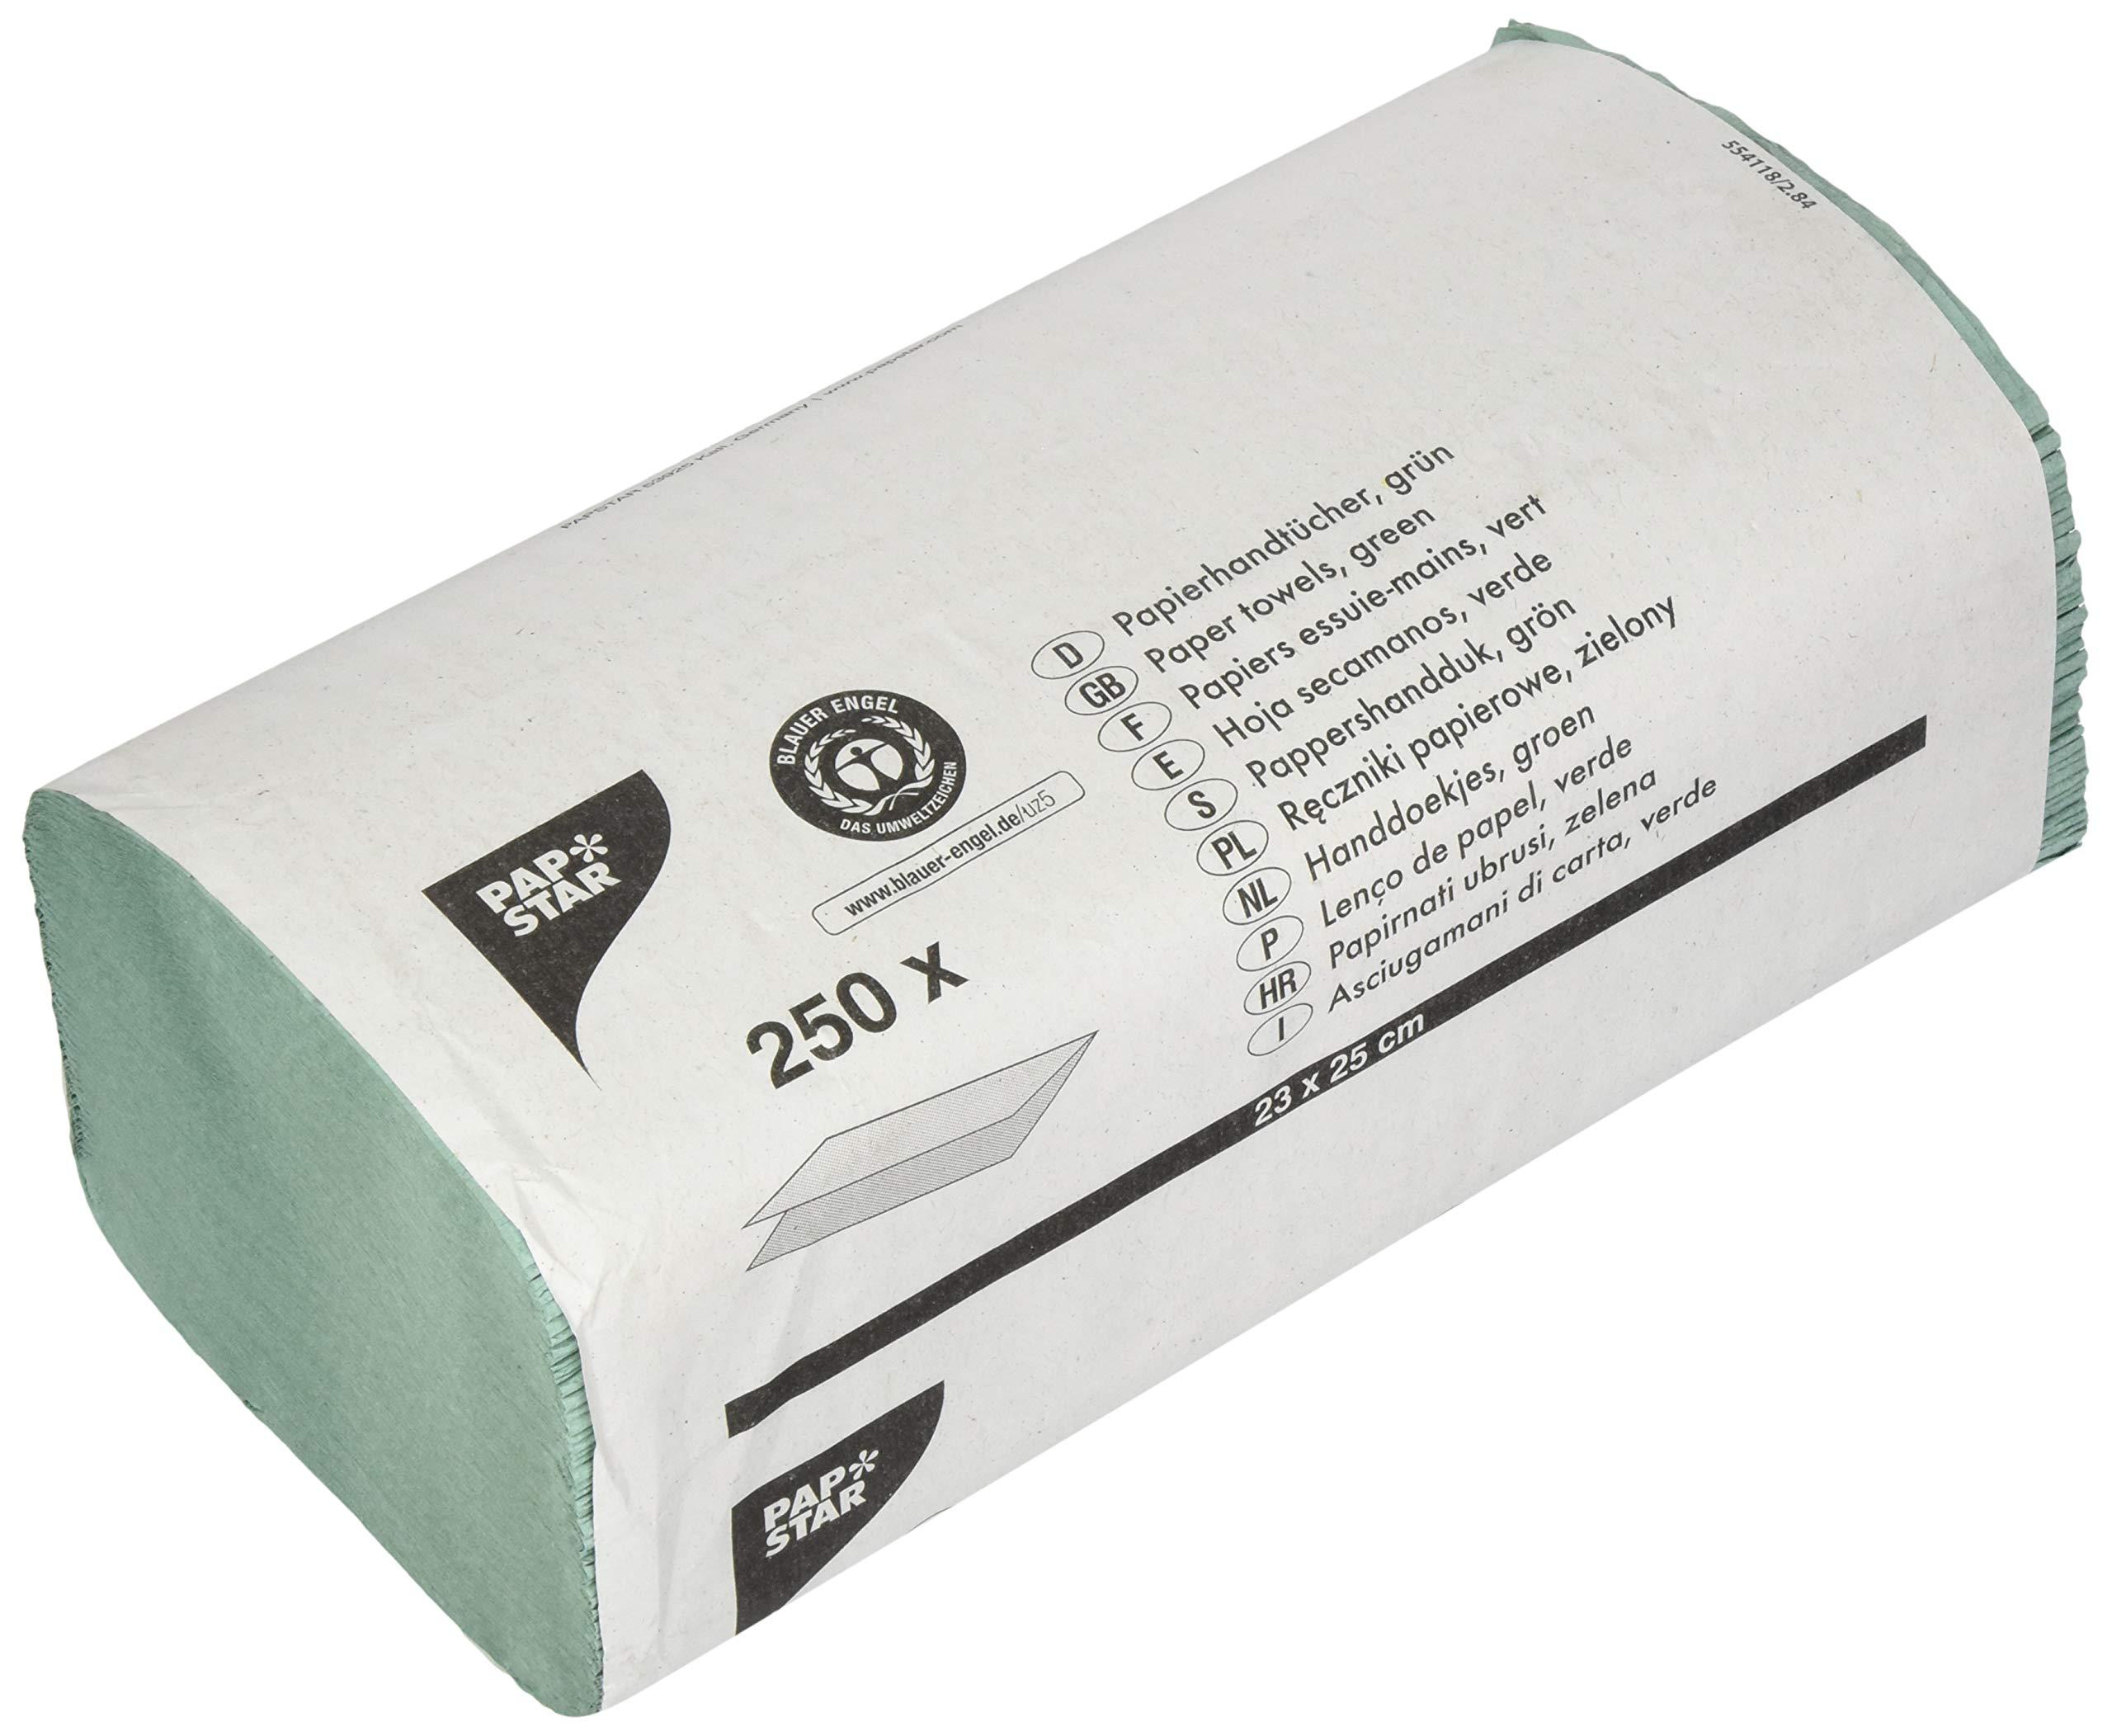 Papstar 17205 Hand Towel Paper 23 Cm X 25 Cm Green Zig Zag V Fold 1 Ply 250 Sheets Buy Online In Burundi At Burundi Desertcart Com Productid 167848621